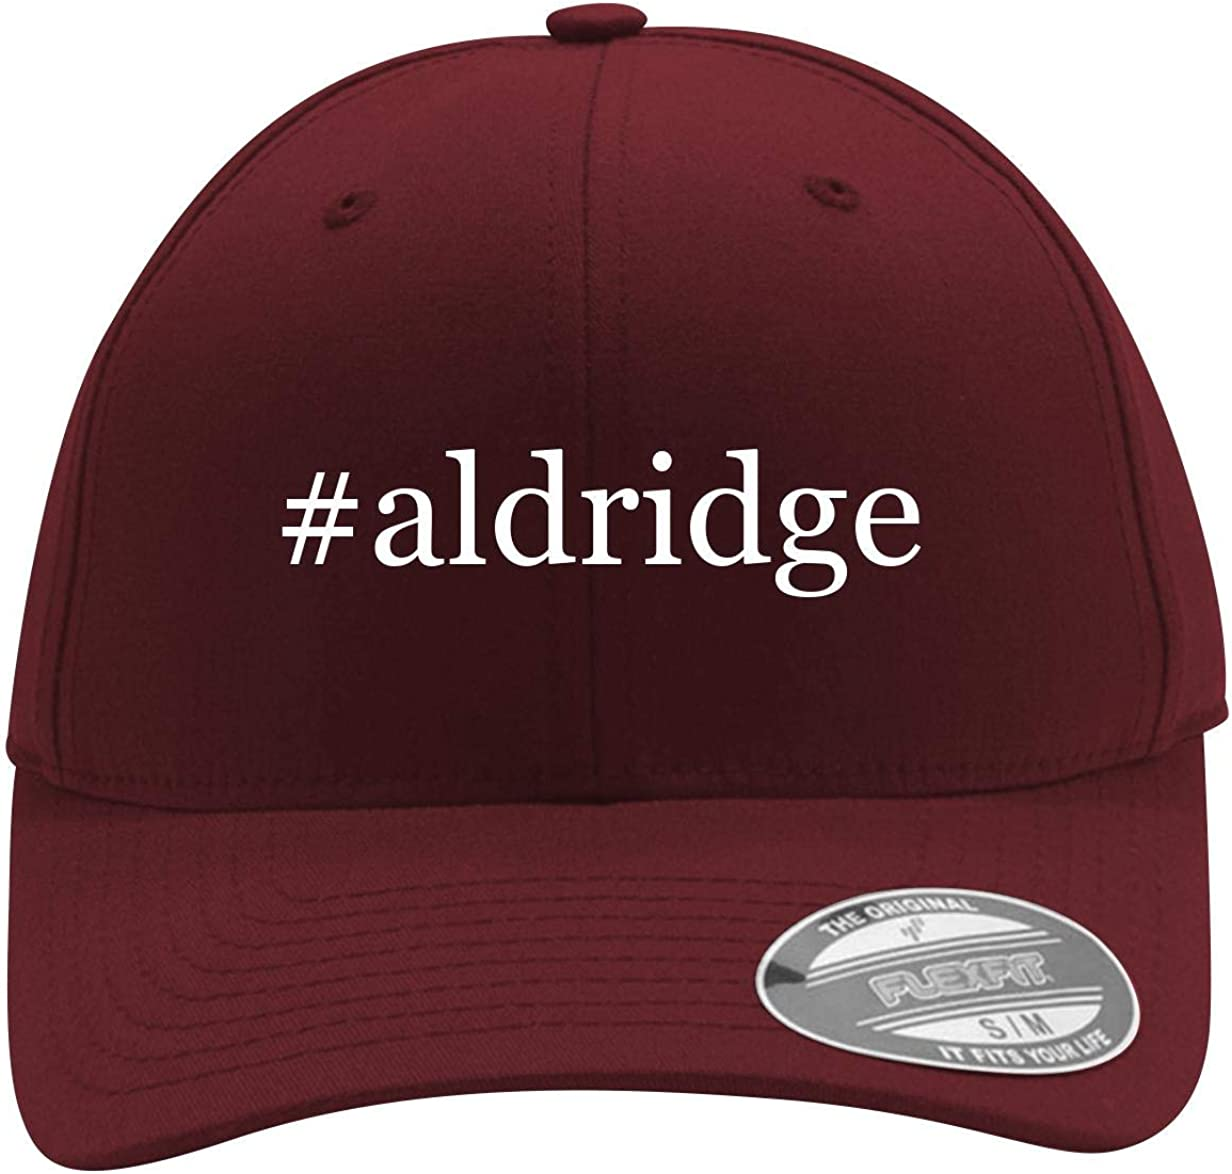 #Aldridge - Men's Hashtag Flexfit Baseball Cap Hat 61pUqTQgPdL